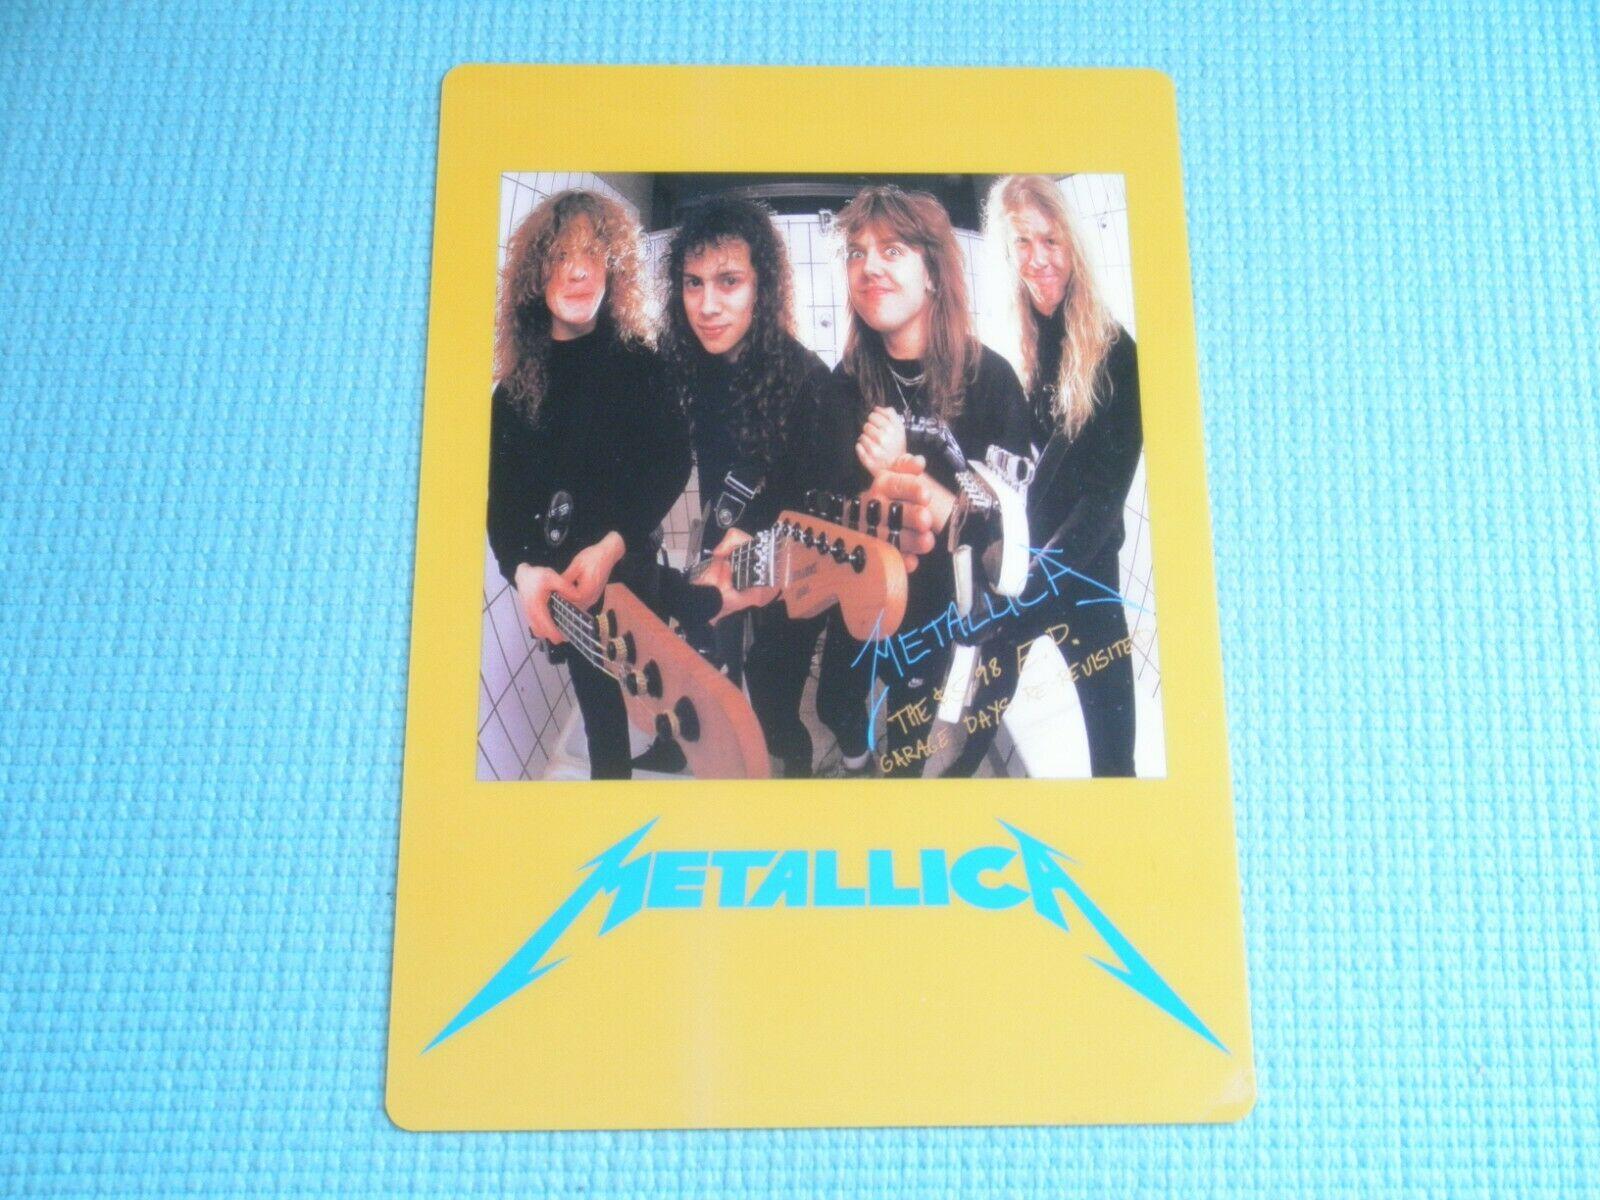 METALLICA Promo Prize Plastic Sheet Garage Days Album 1st Press Japan CD 12  LP